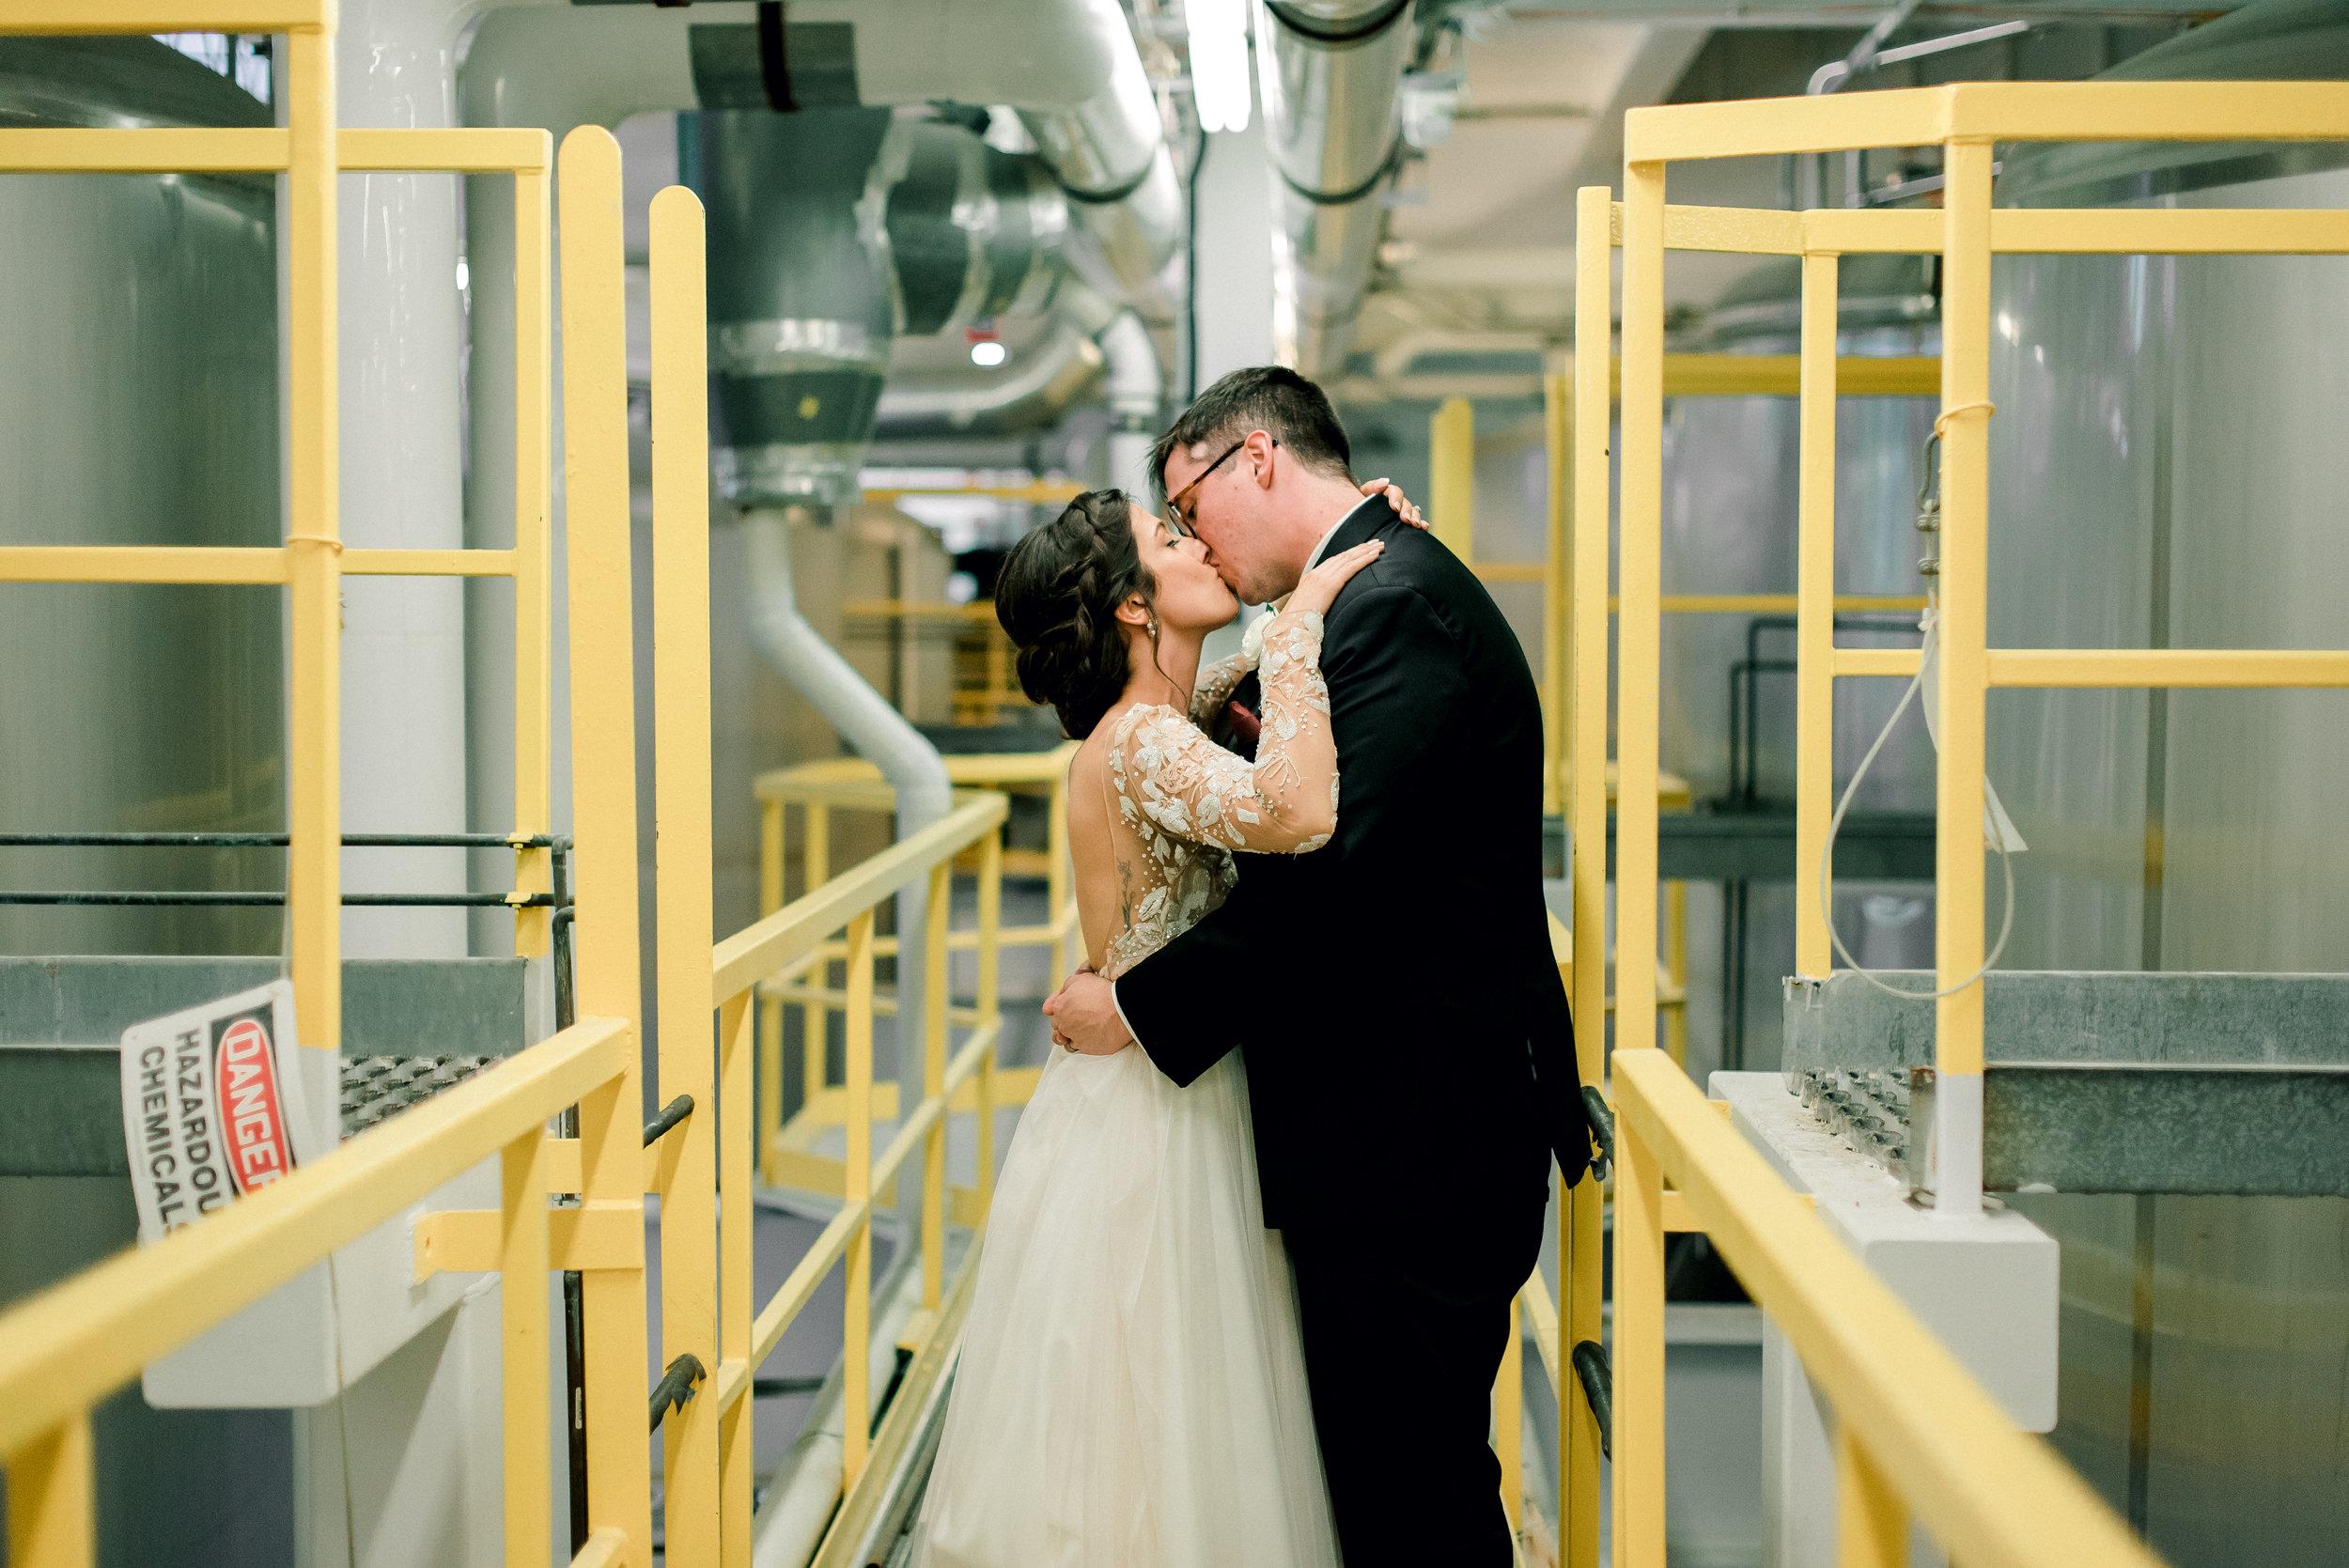 cleveland-wedding-photographer-great-lakes-brewing-arcade-0061.jpg